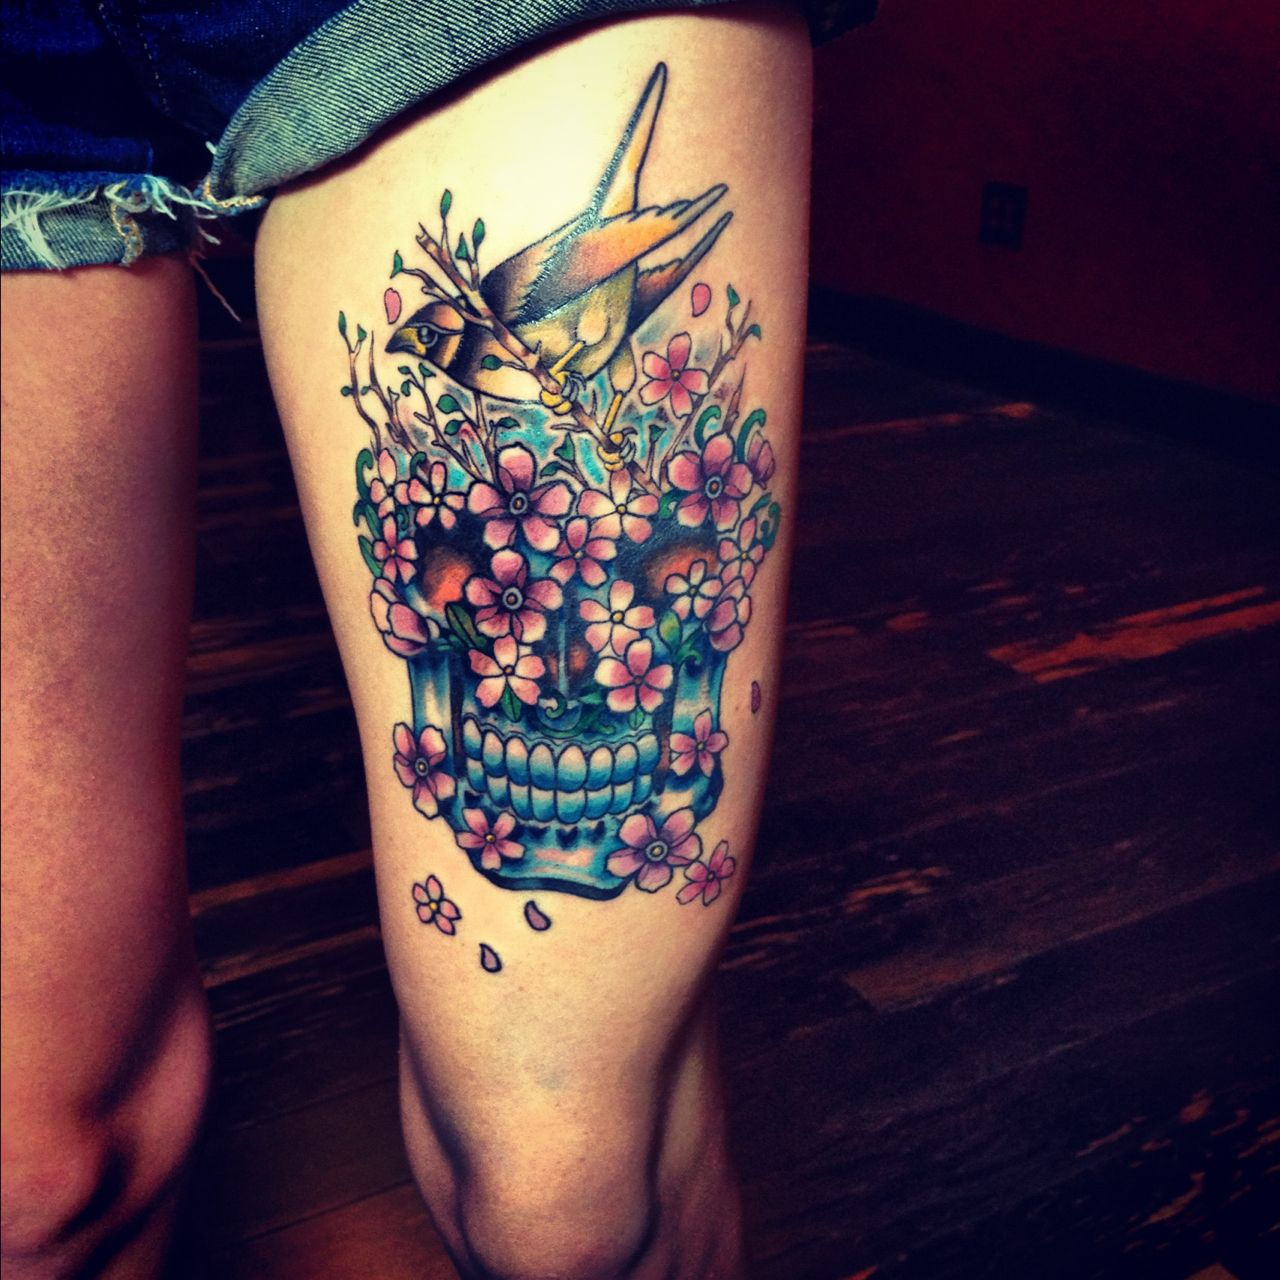 Ideas about bird tattoos on pinterest tattoos - Sugar Skull Thigh Tattoo With Cherry Blossom And Bird